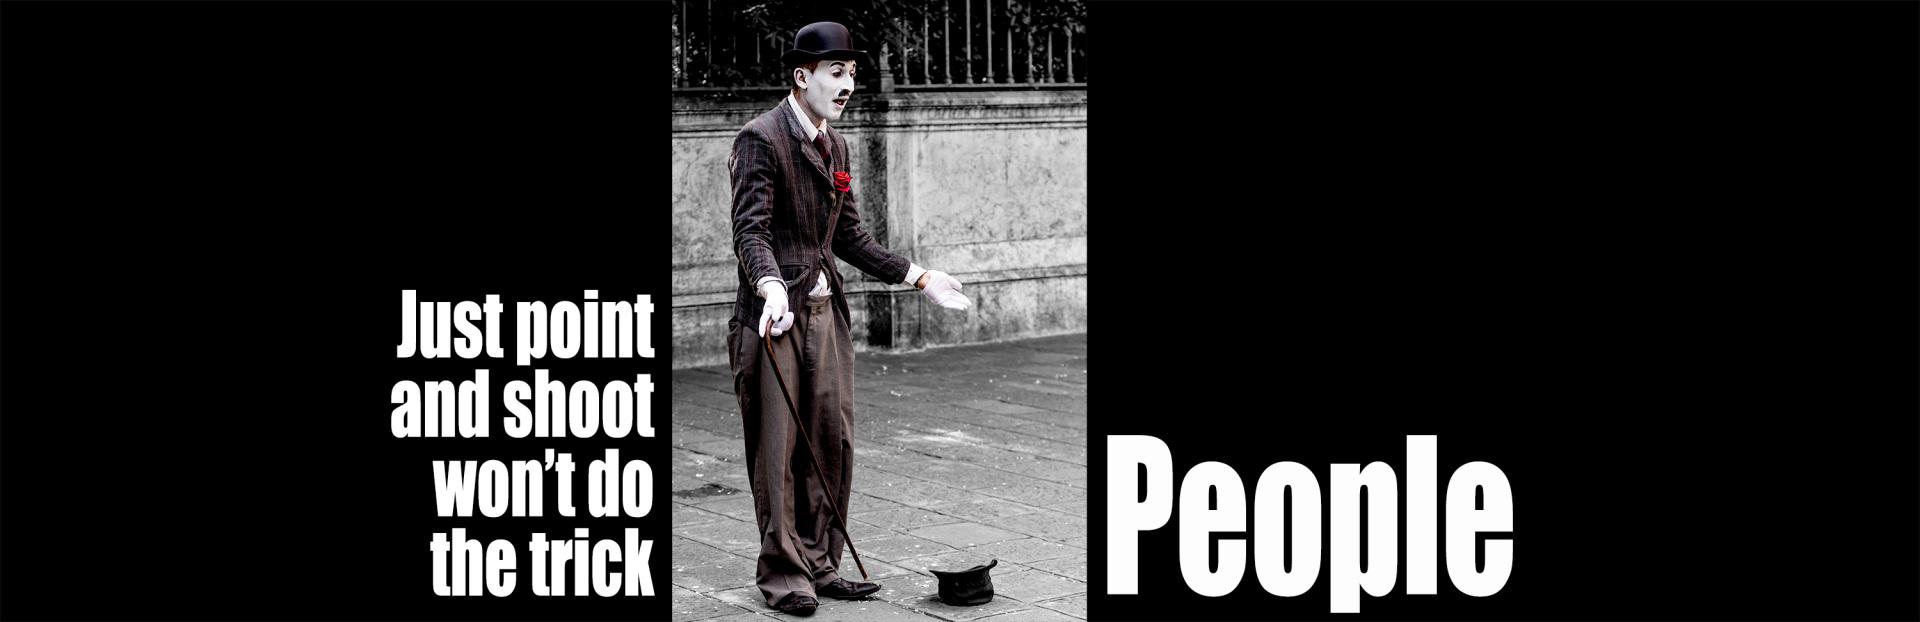 Banner wostphoto categorie portfolio_people